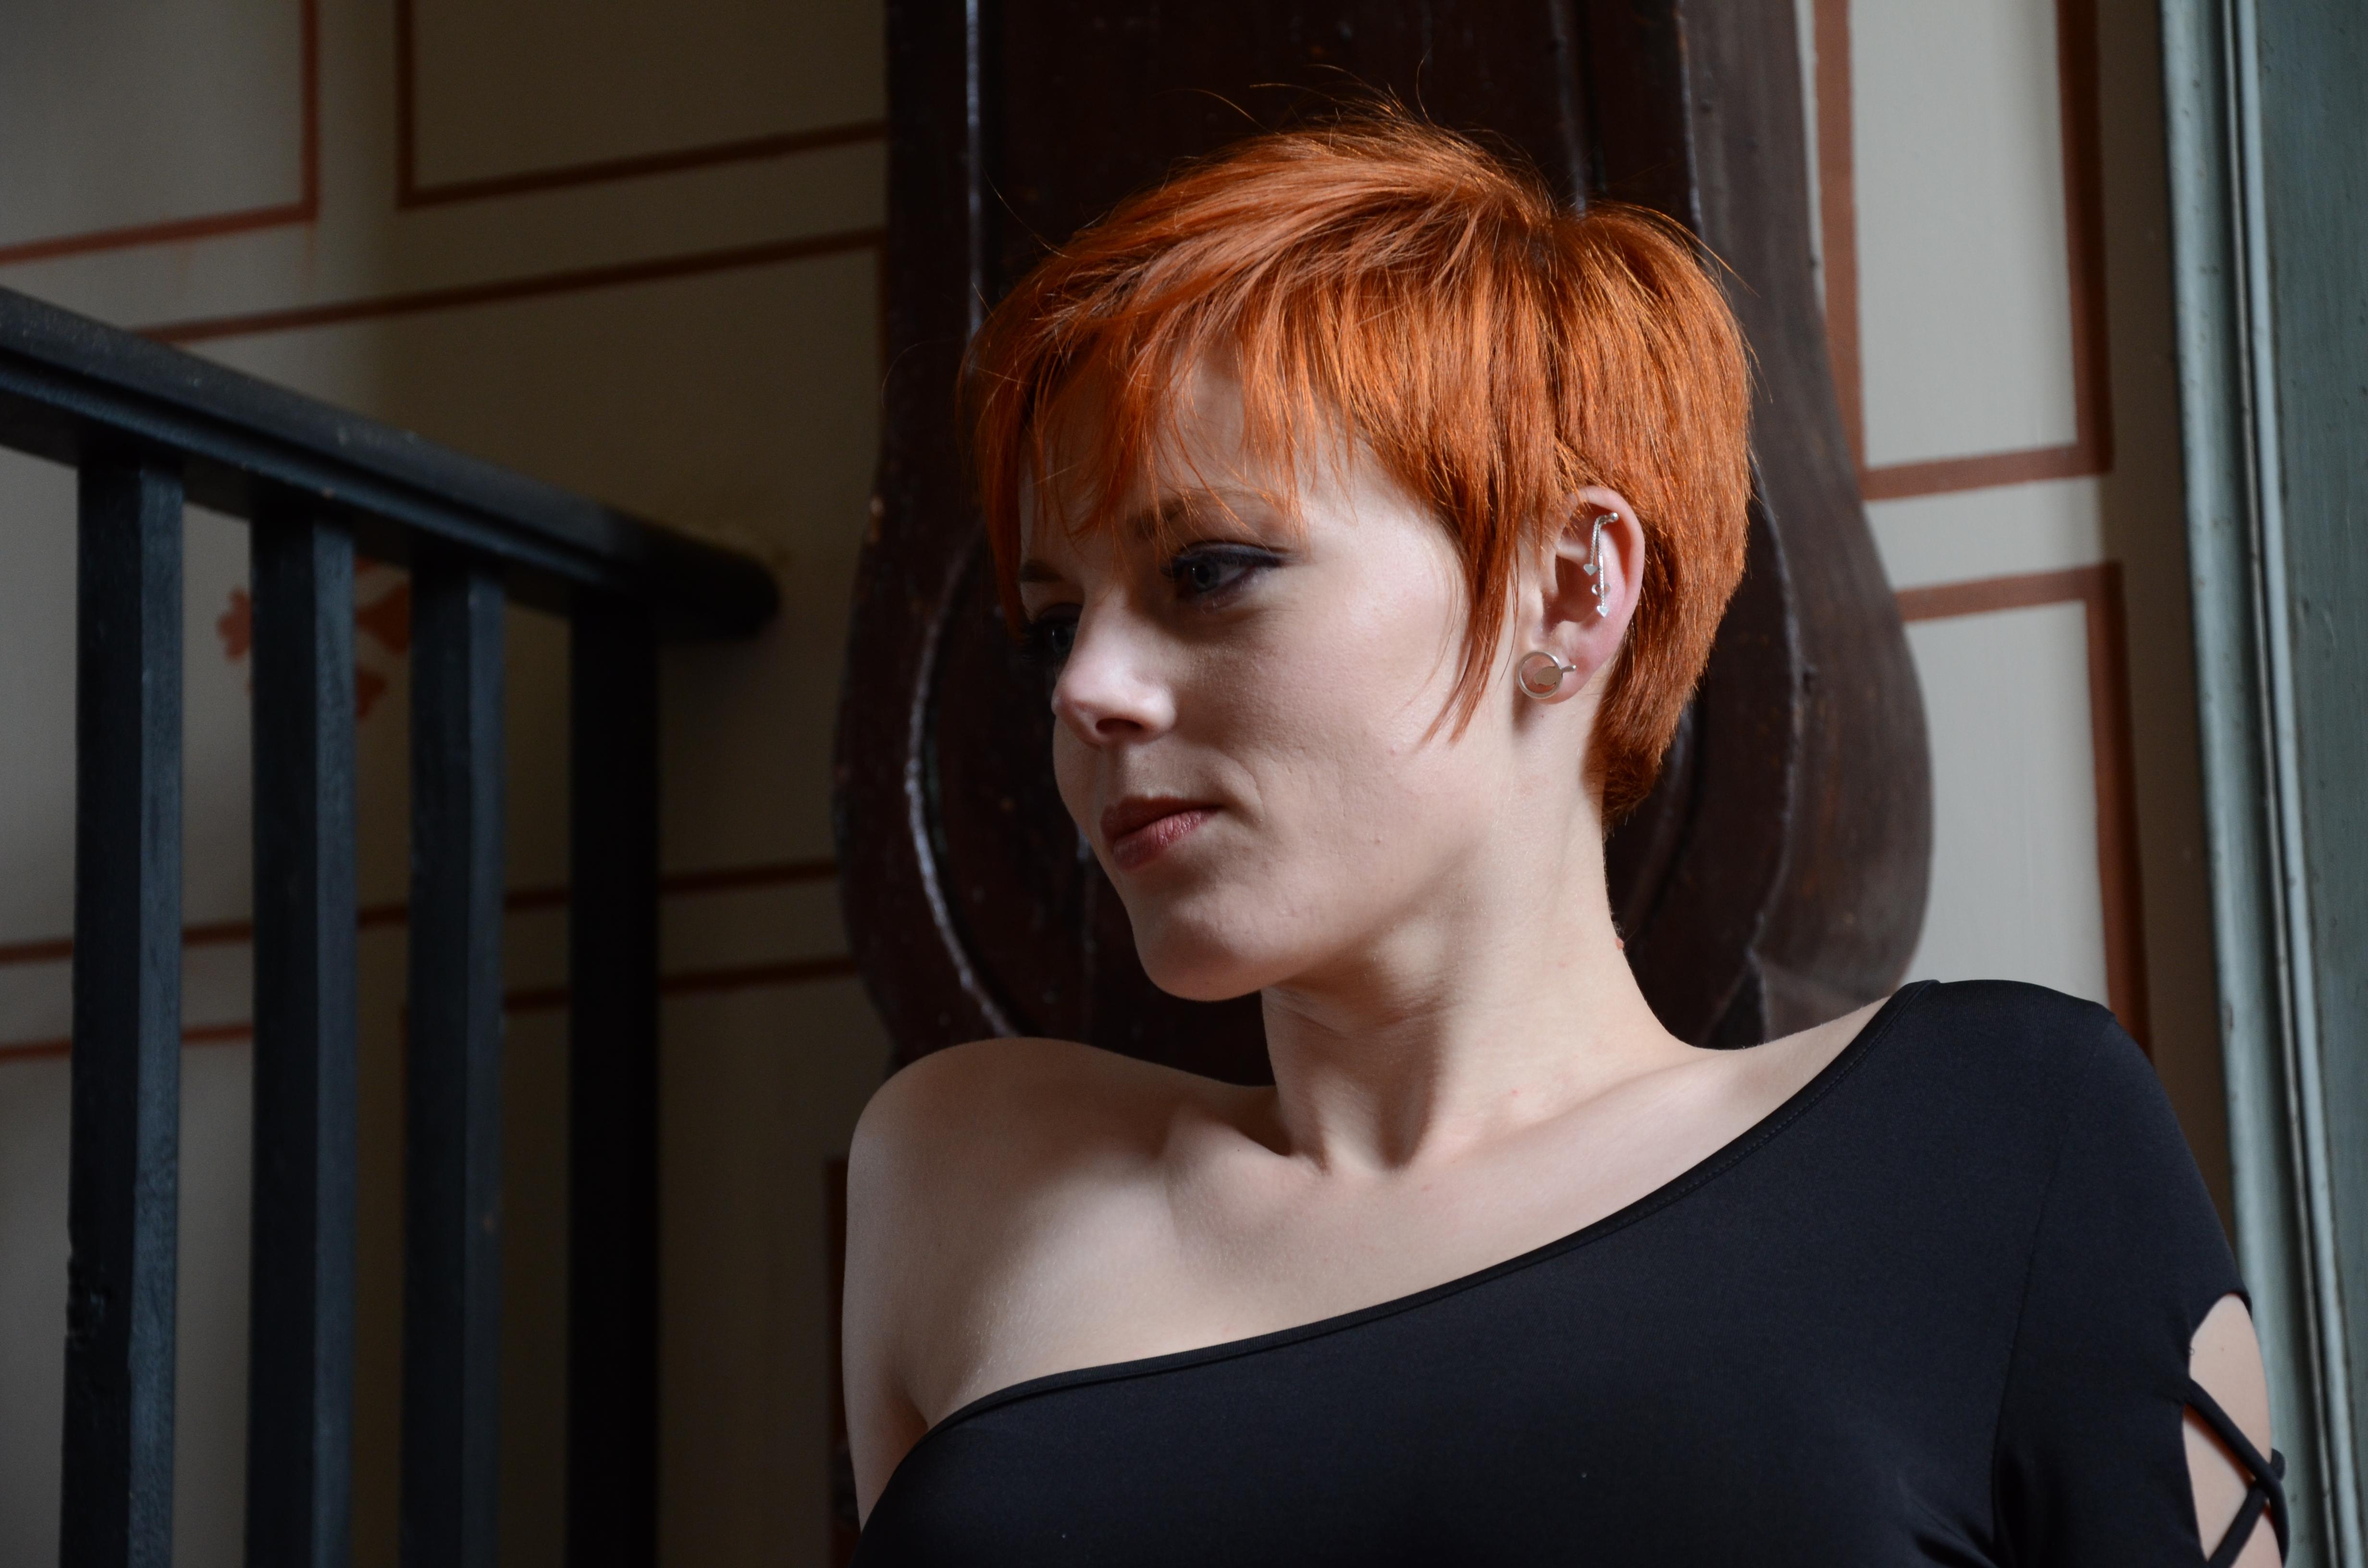 Coupe femme cheveux courts fins